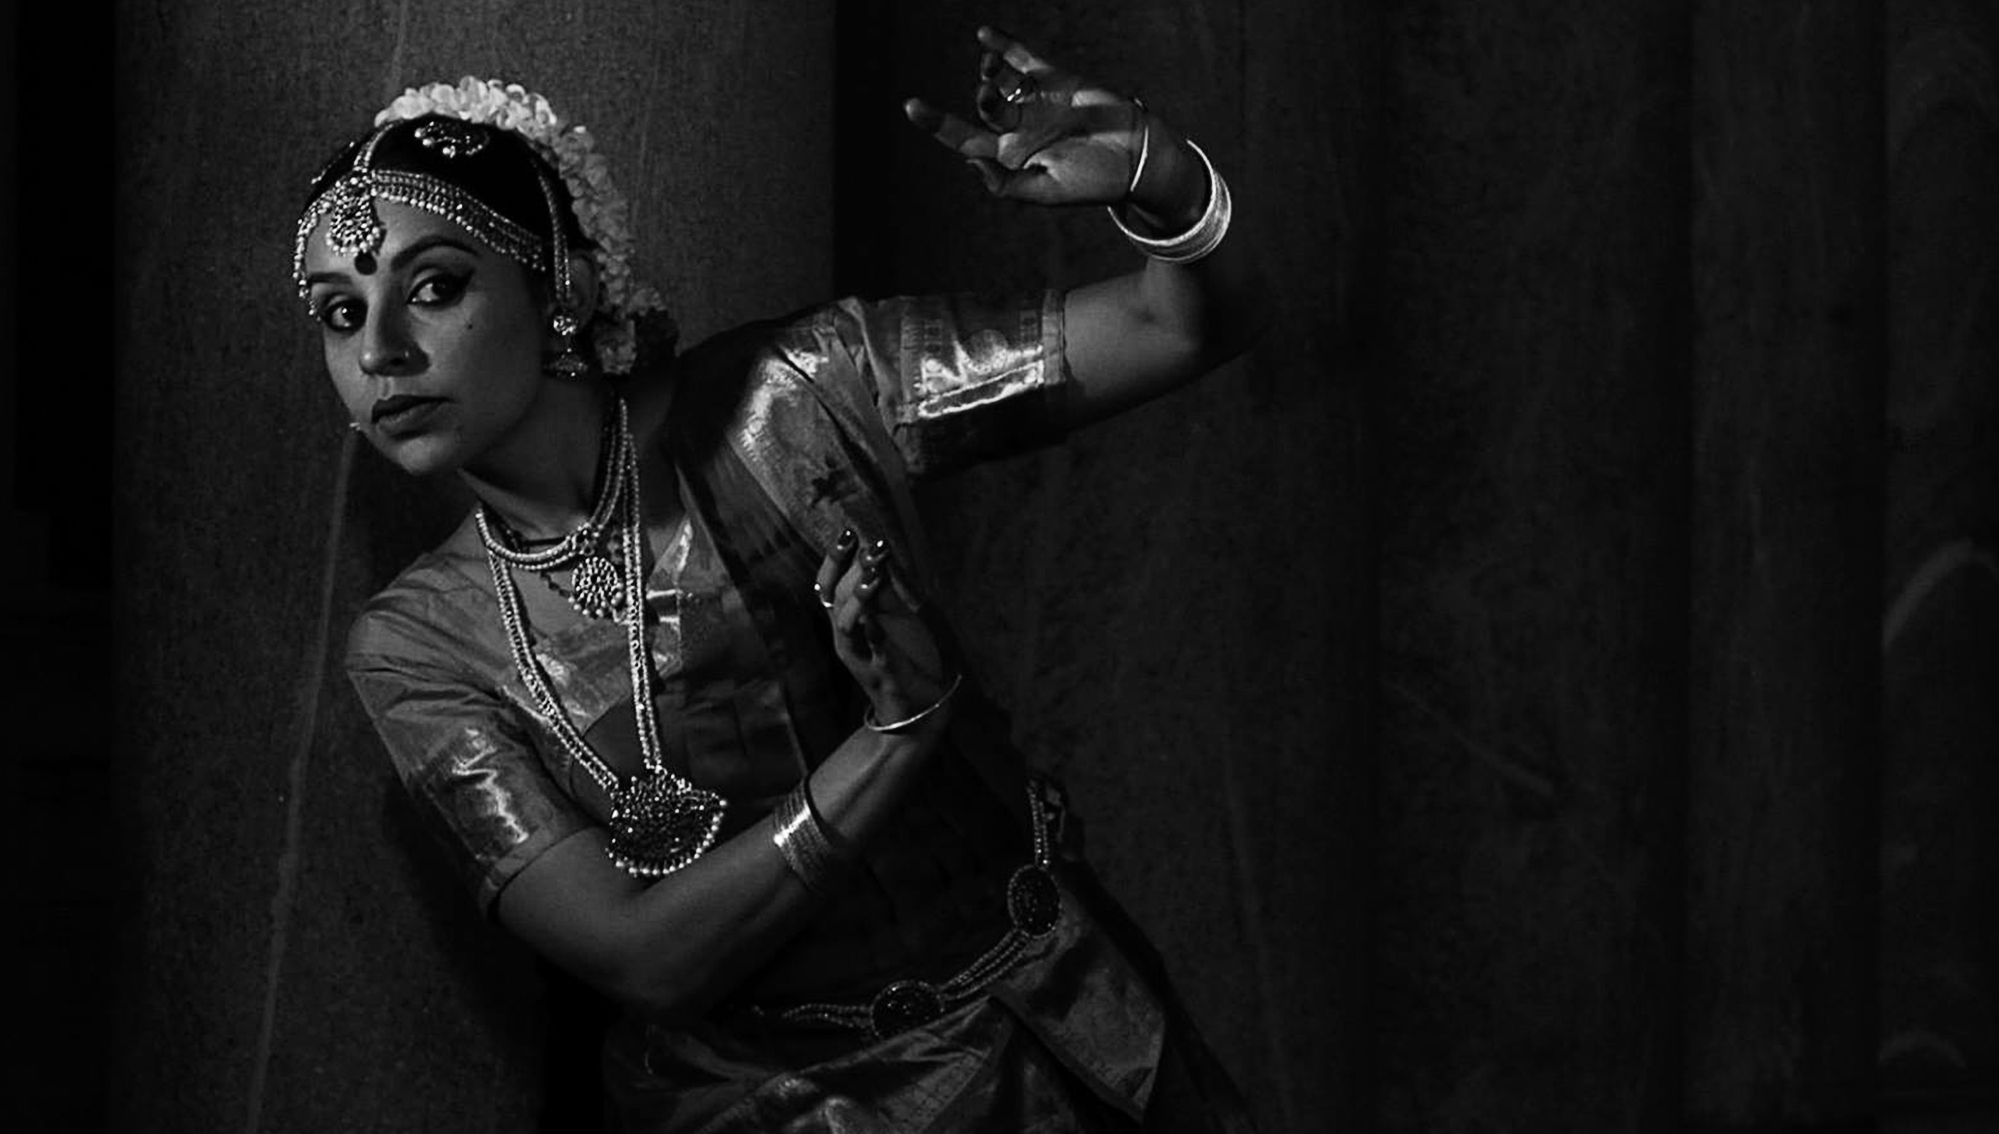 Grupo de pesquisa promove espetáculo de dança clássica indiana